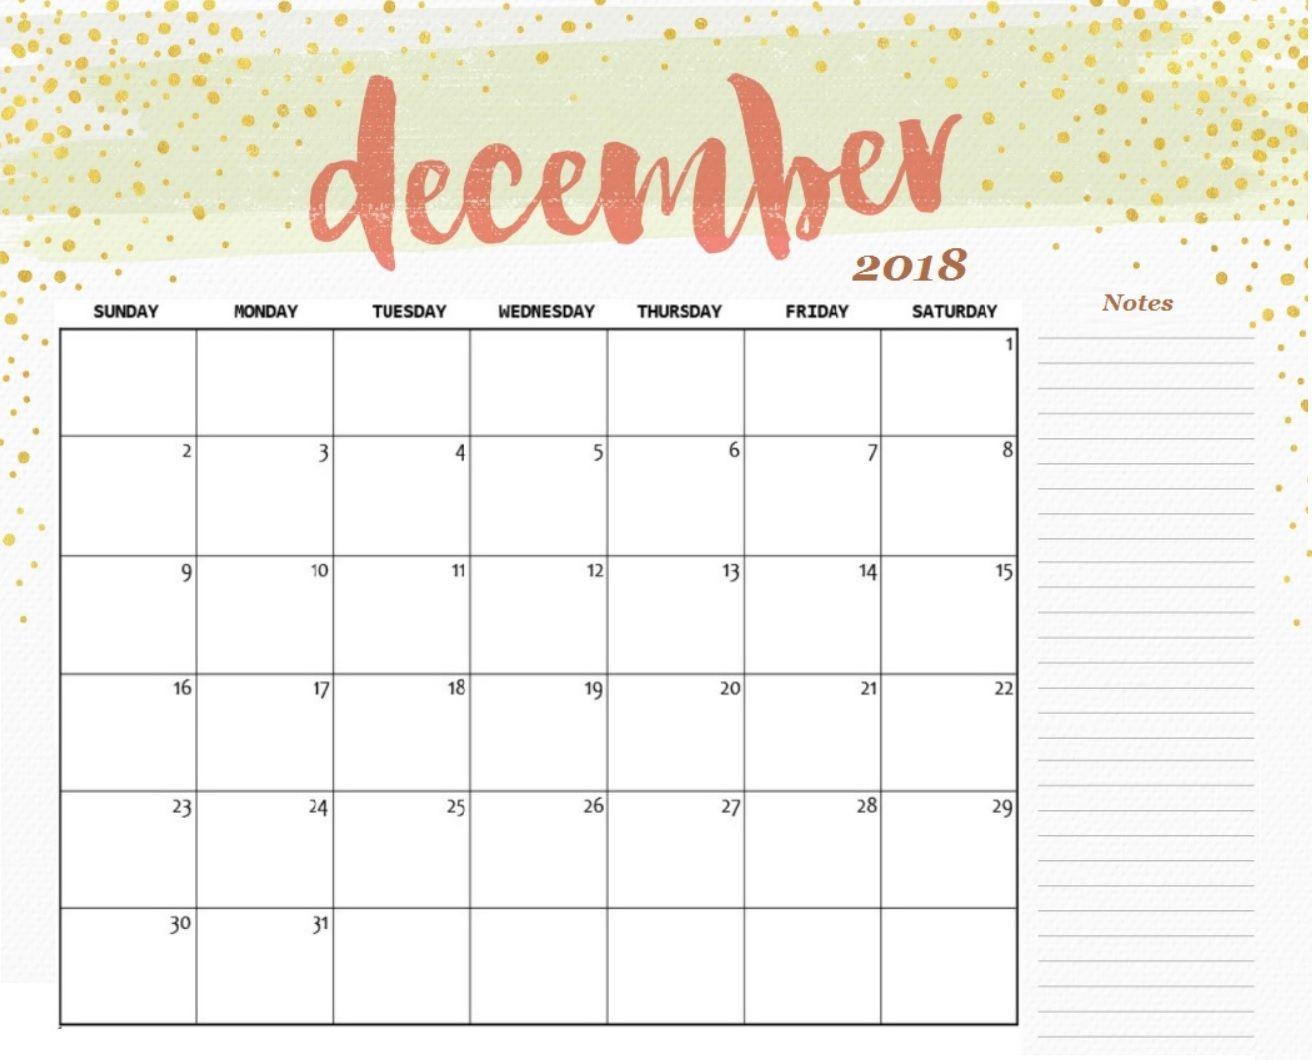 December 2018 Calendar Printable Template | 100+ December 2018 with December Calendar Printable Template